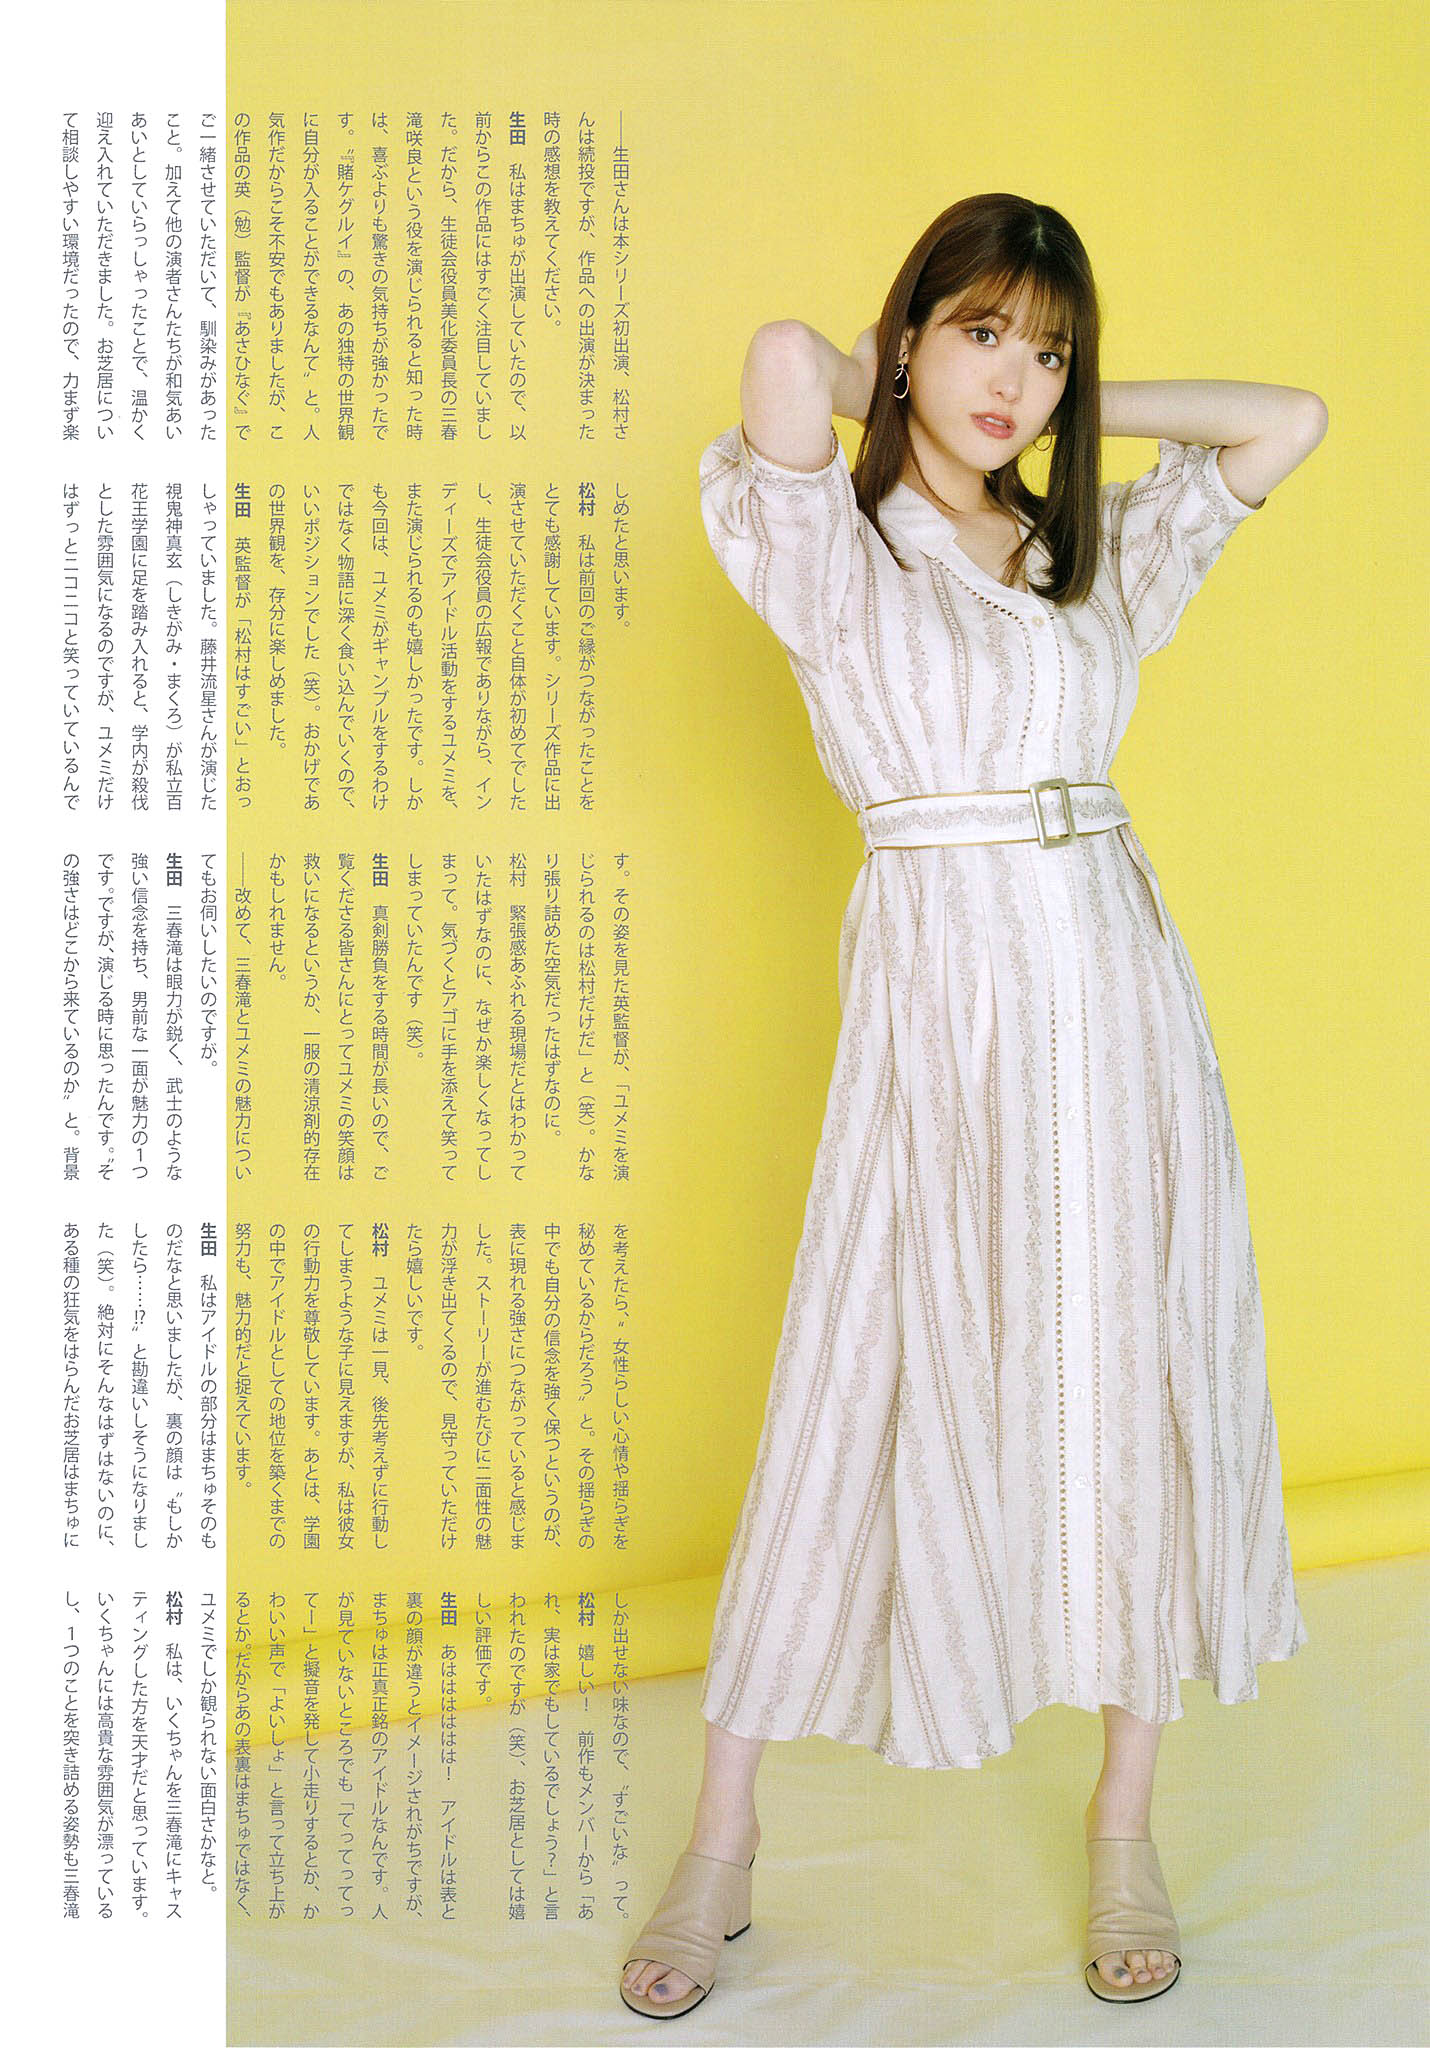 EIkuta SMatsumura Big One Girls 2105 06.jpg